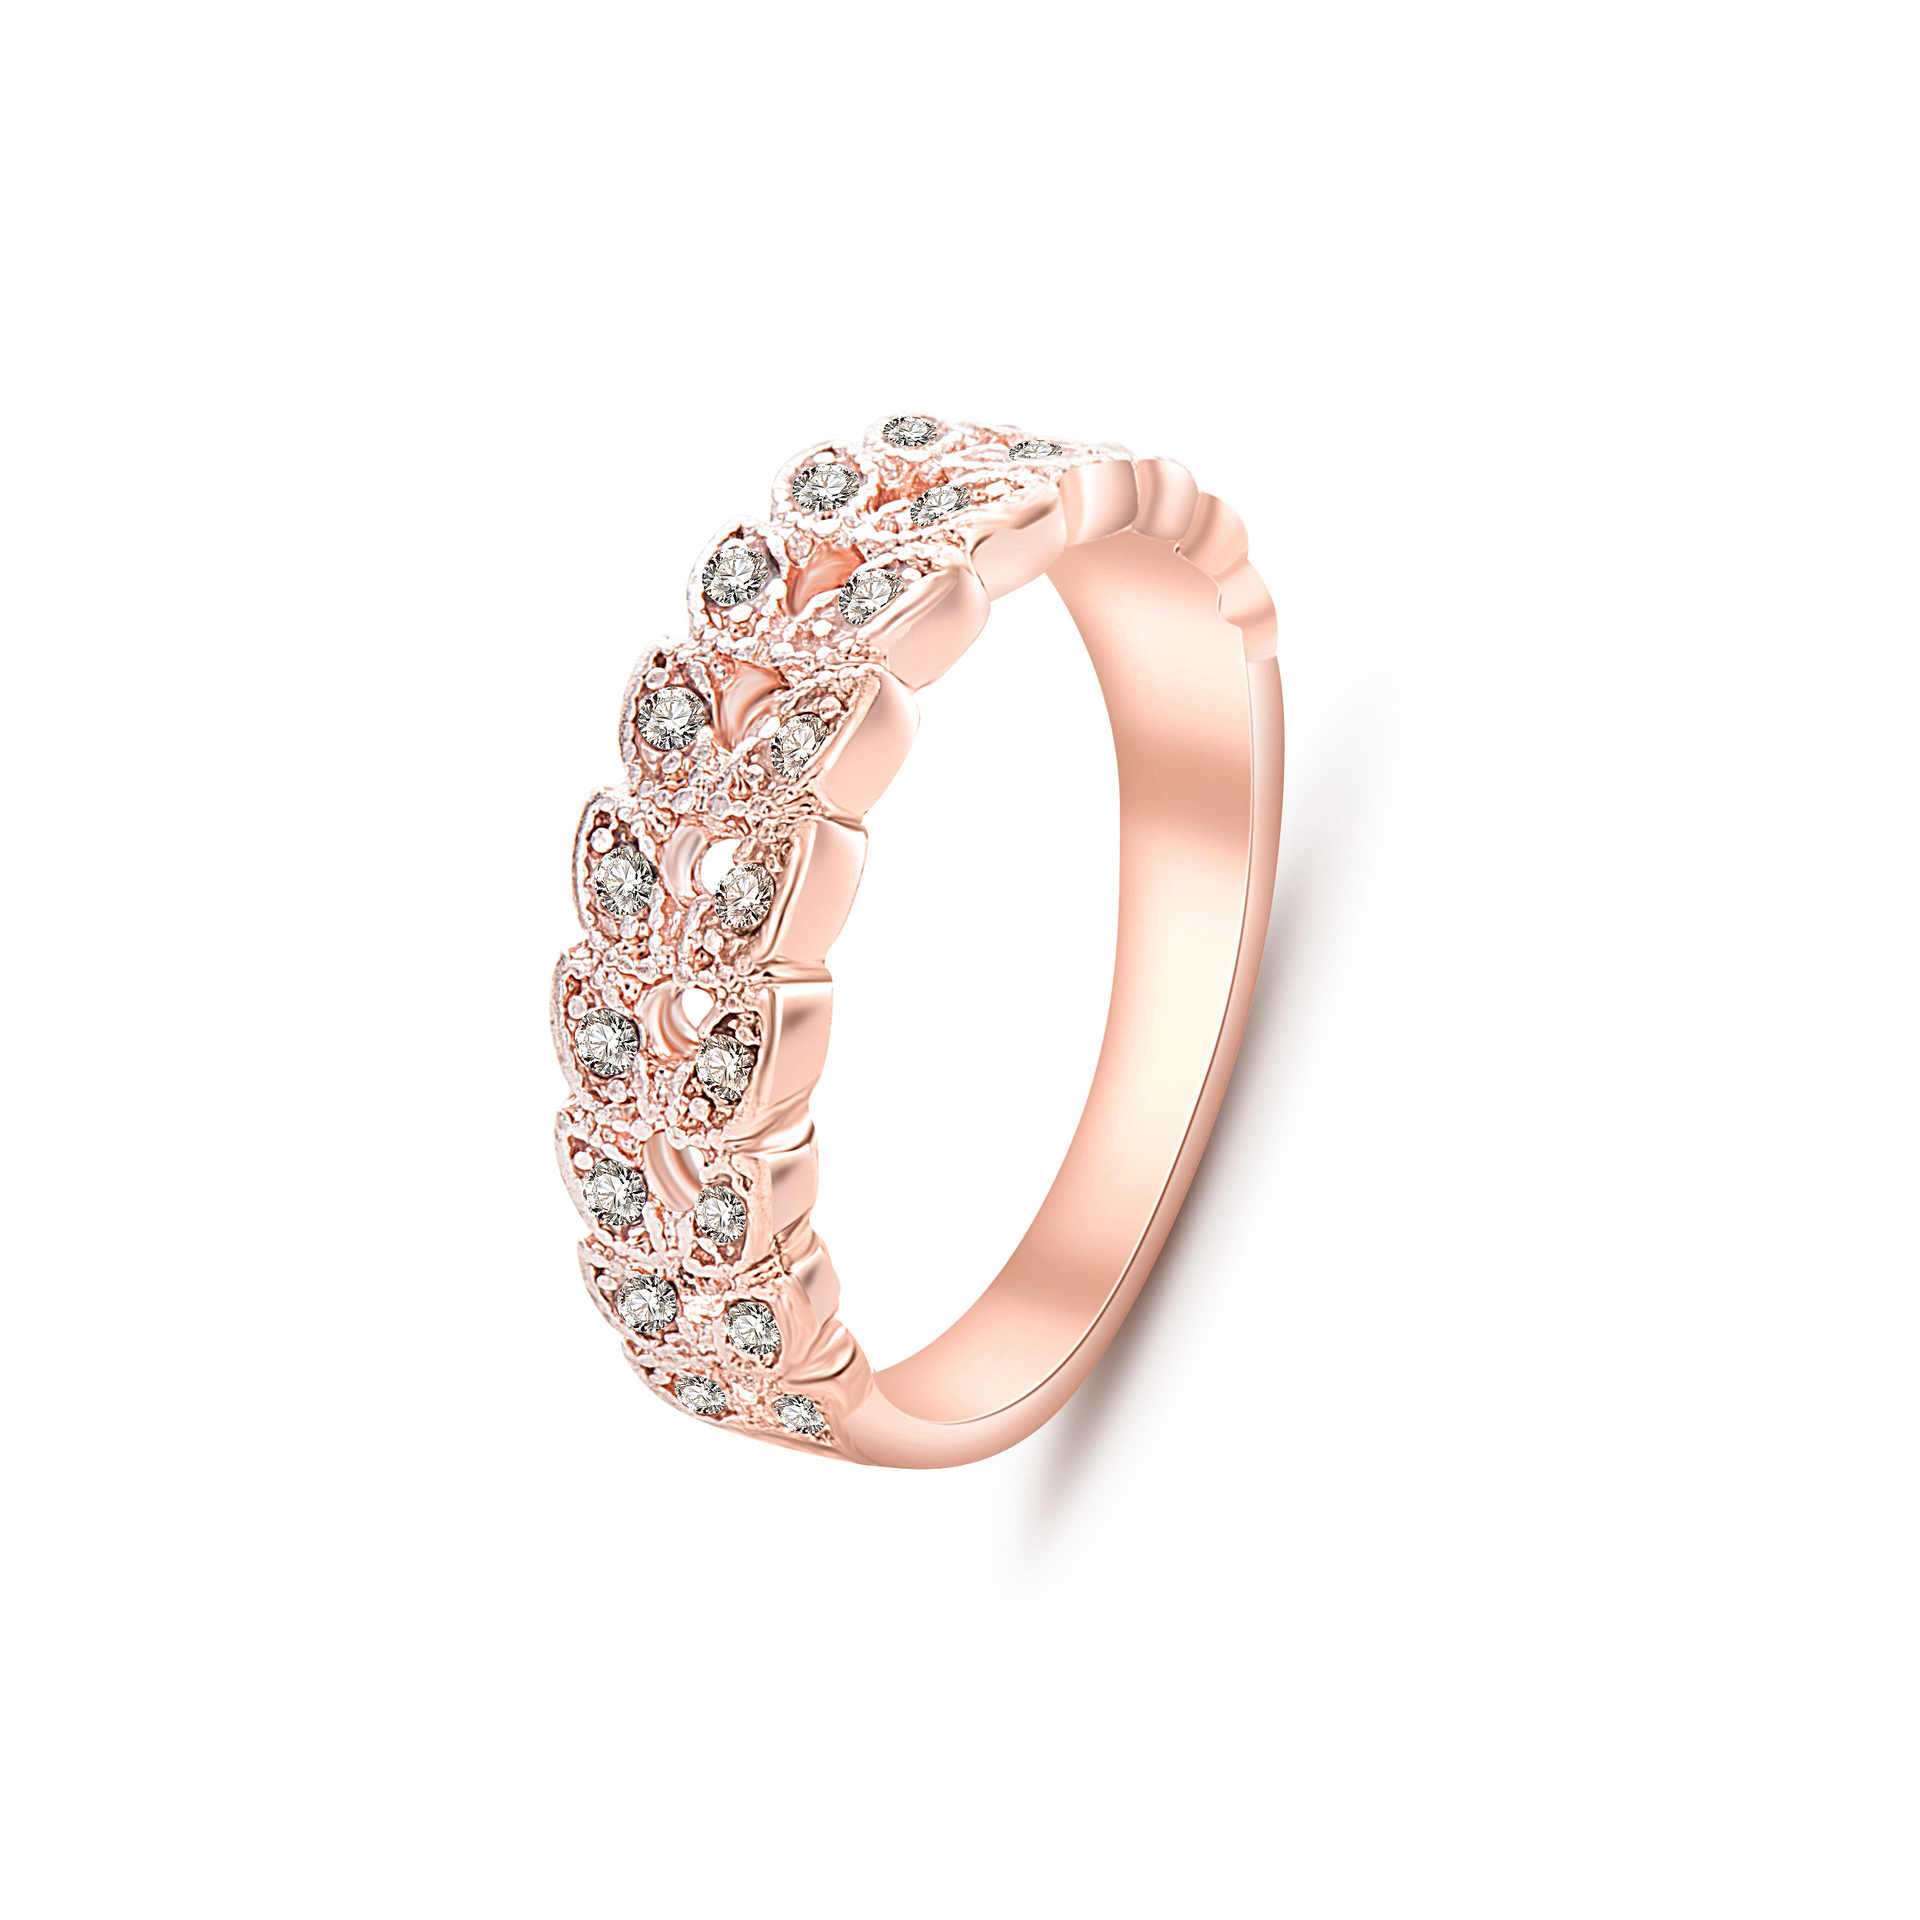 2018 anillos de cristal Simple de oro rosa para mujer anillos de boda con forma de hoja para damas anillos de dedo de moda para mujeres cumpleaños regalos